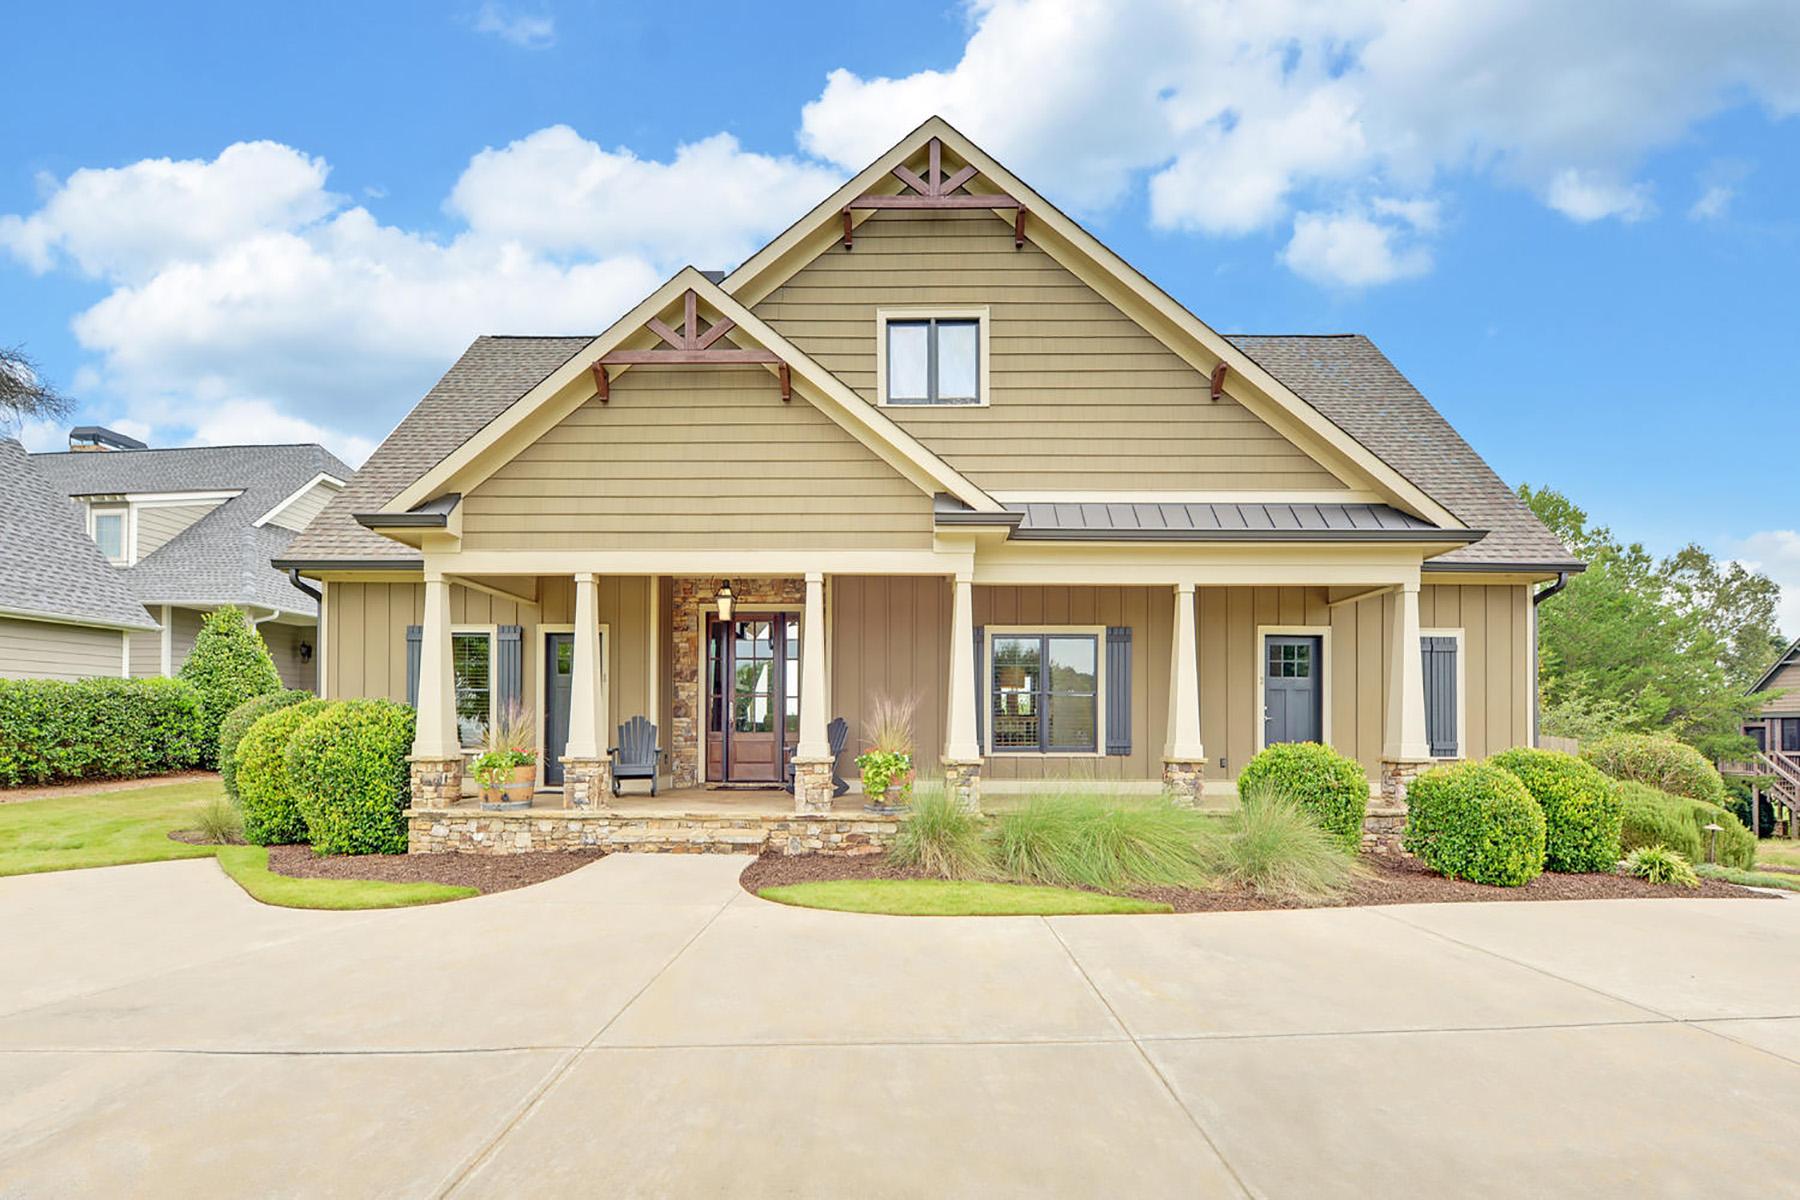 Single Family Homes for Sale at Lakeside Golf Retreat 65 Cottage Lane, Toccoa, Georgia 30577 United States